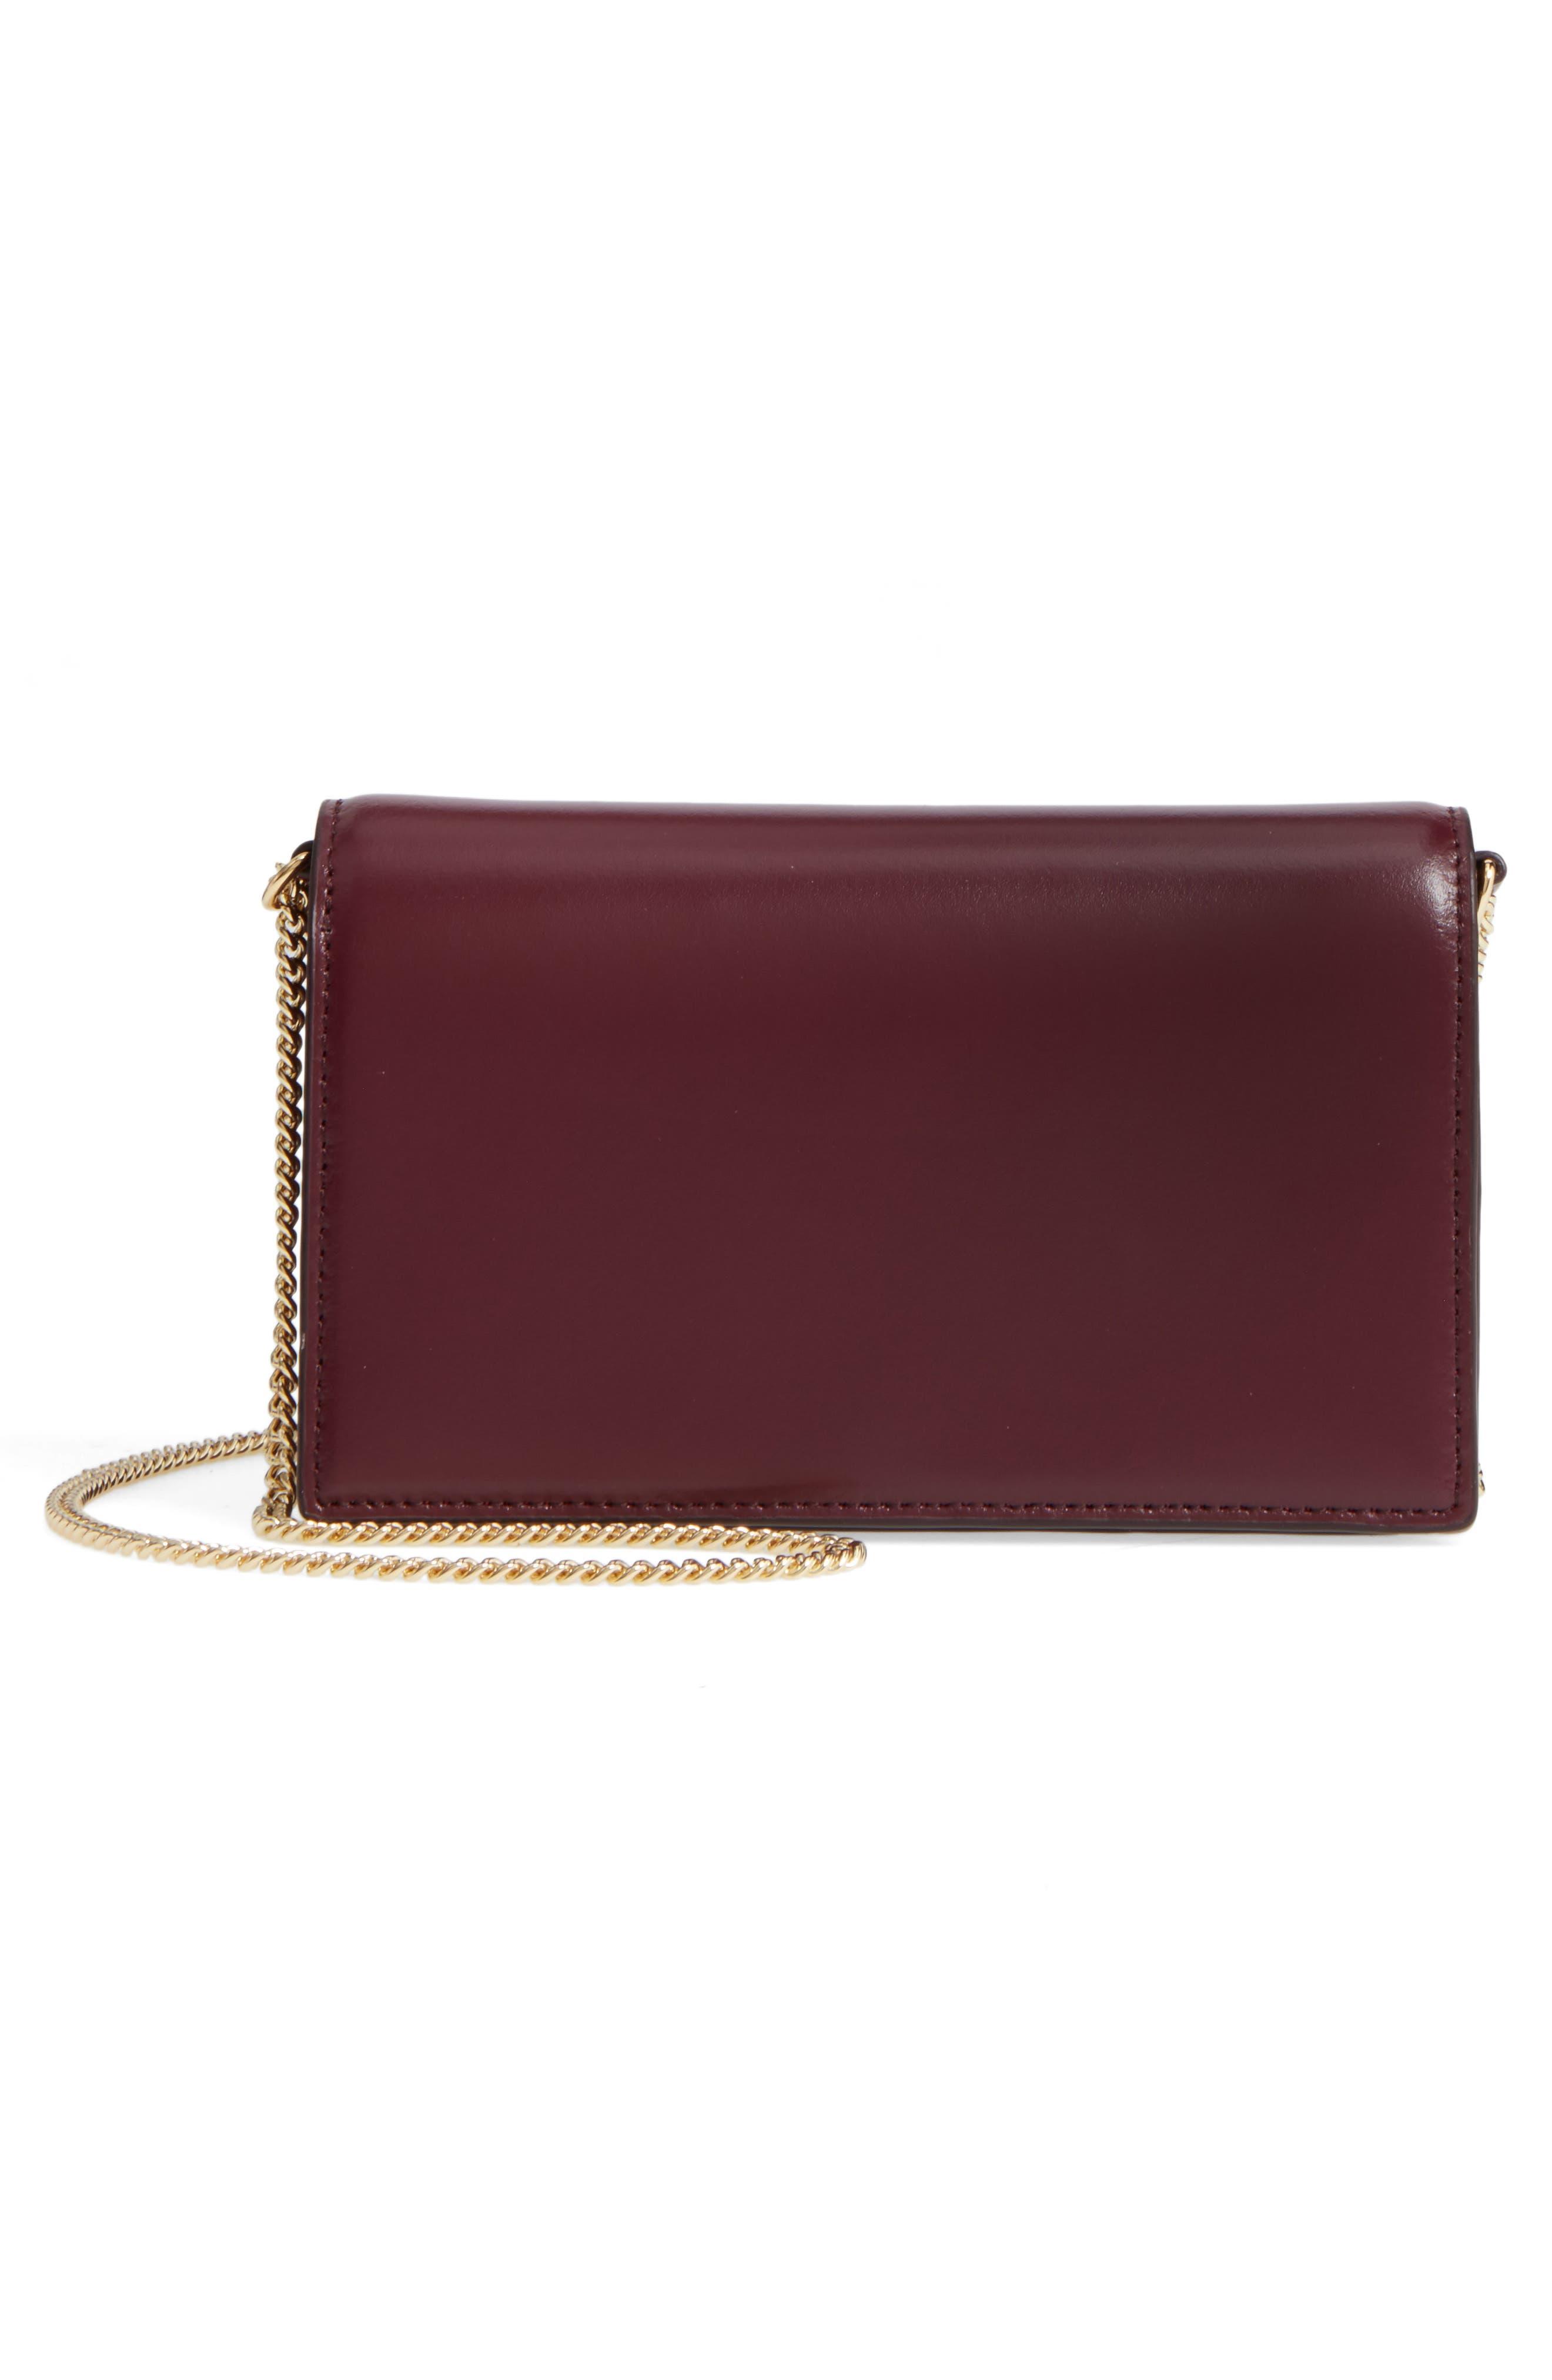 Soirée Leather Convertible Crossbody Bag,                             Alternate thumbnail 9, color,